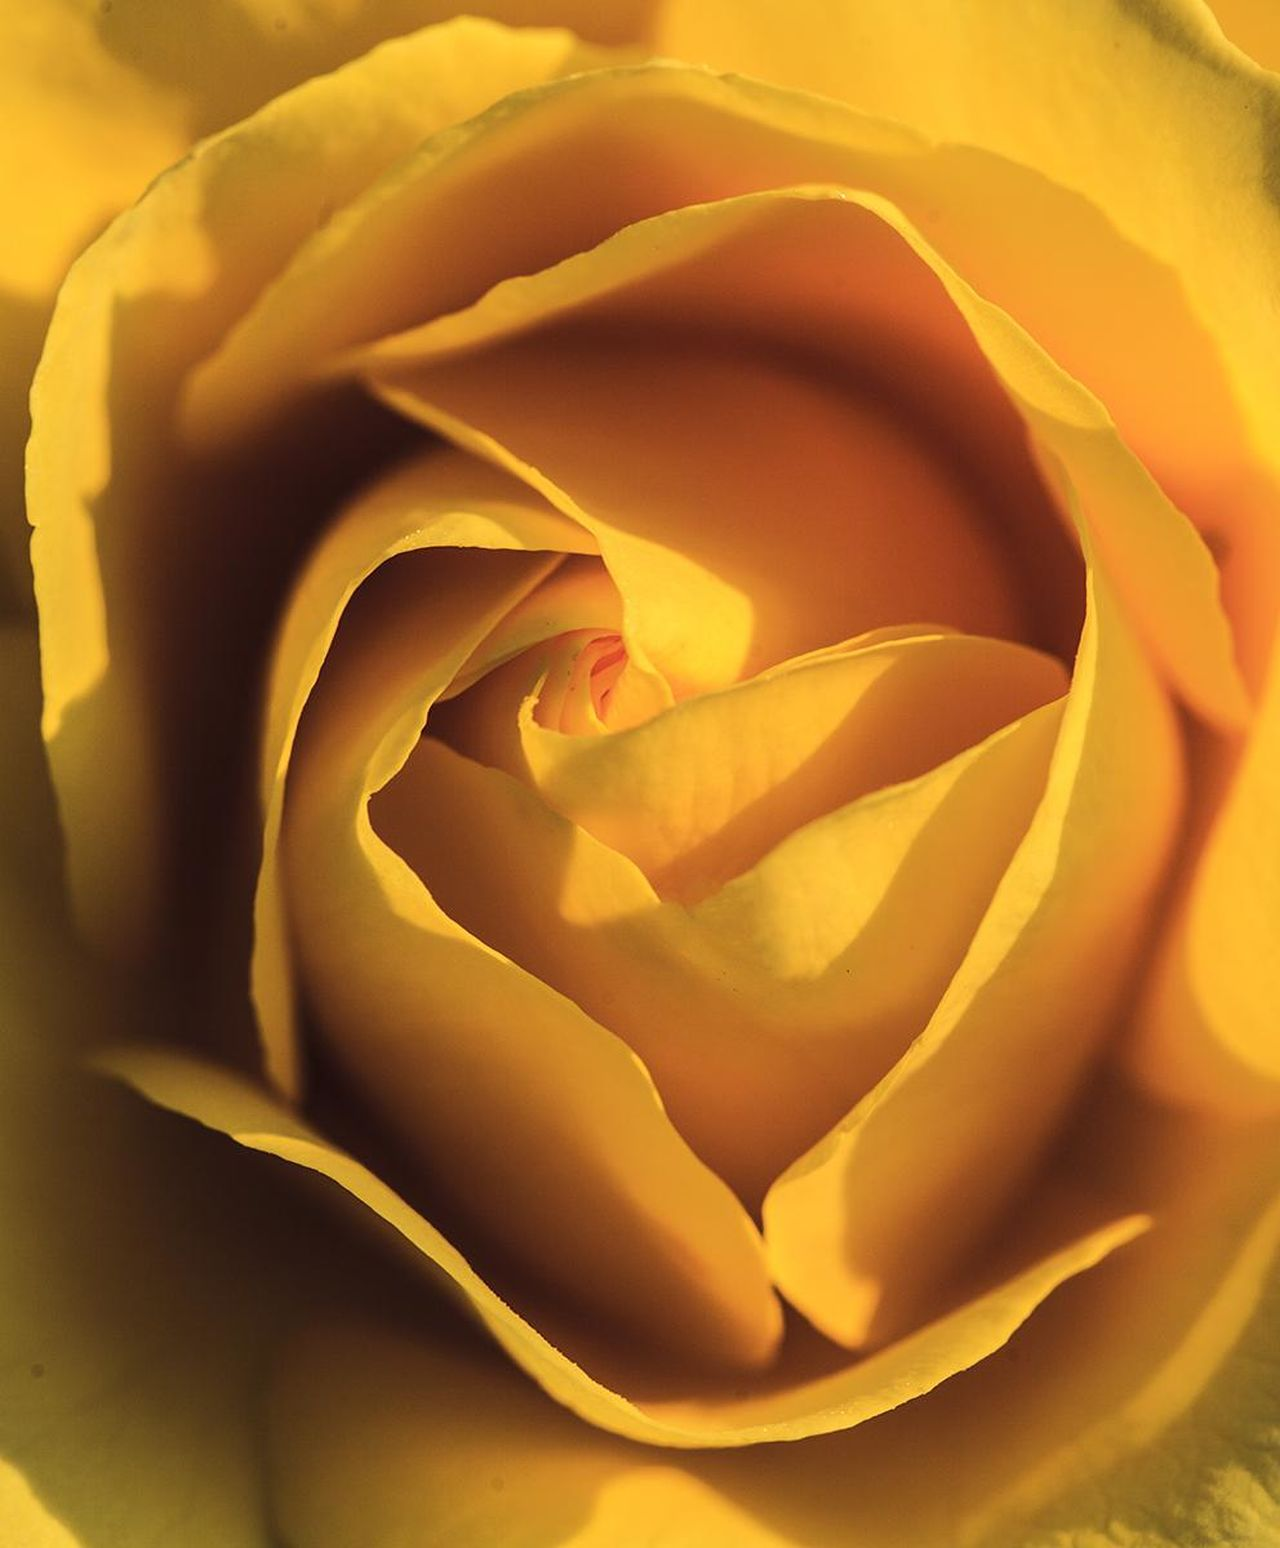 Rose🌹 Yellow Rose Yellow Color Macro Close-up Big Close Up Natural Beauty Nature Nature Photography